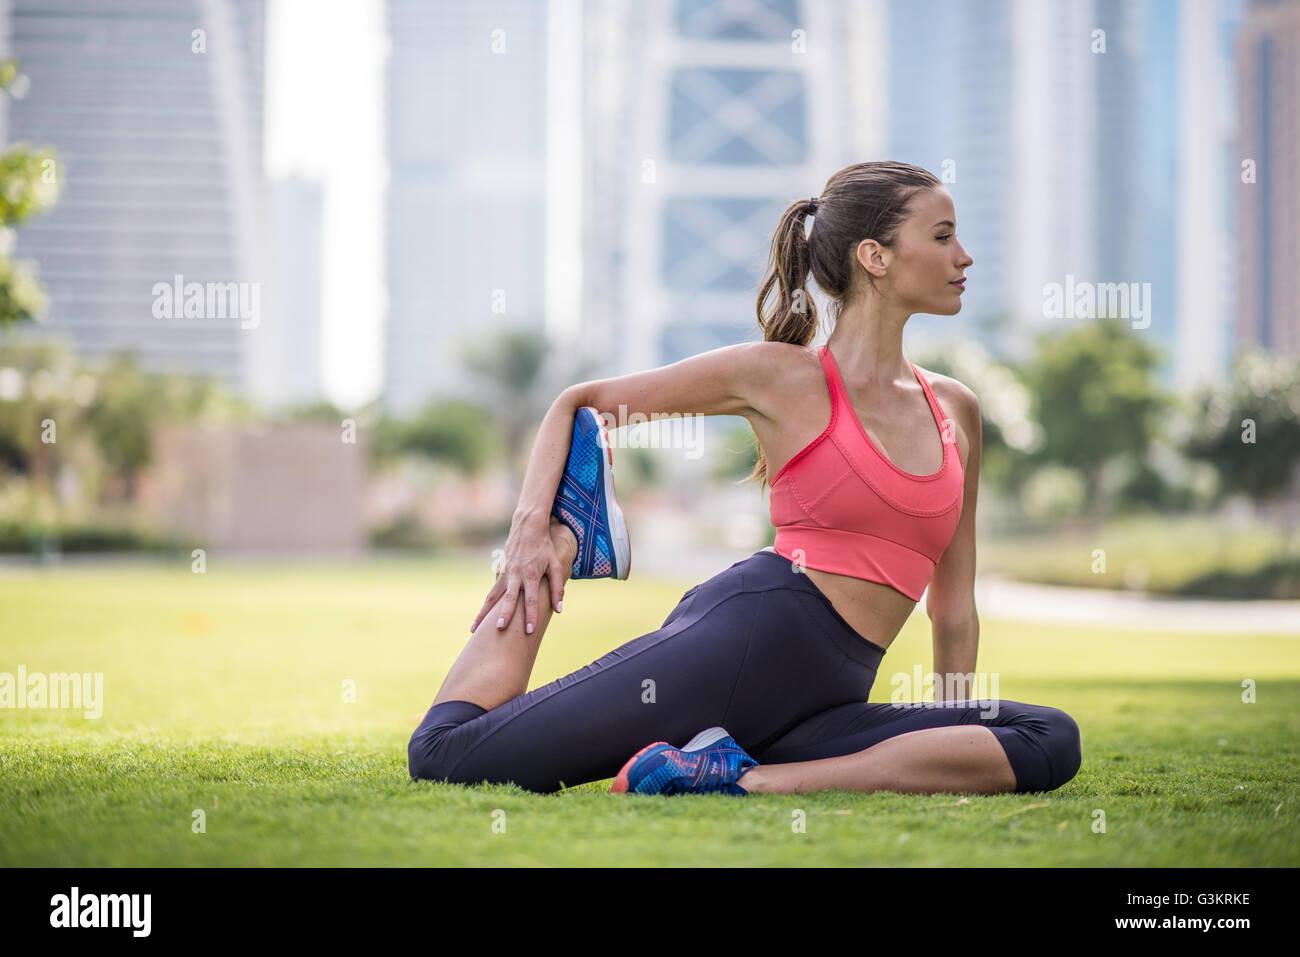 Woman practicing yoga pose in park, Dubai, United Arab Emirates - Stock Image